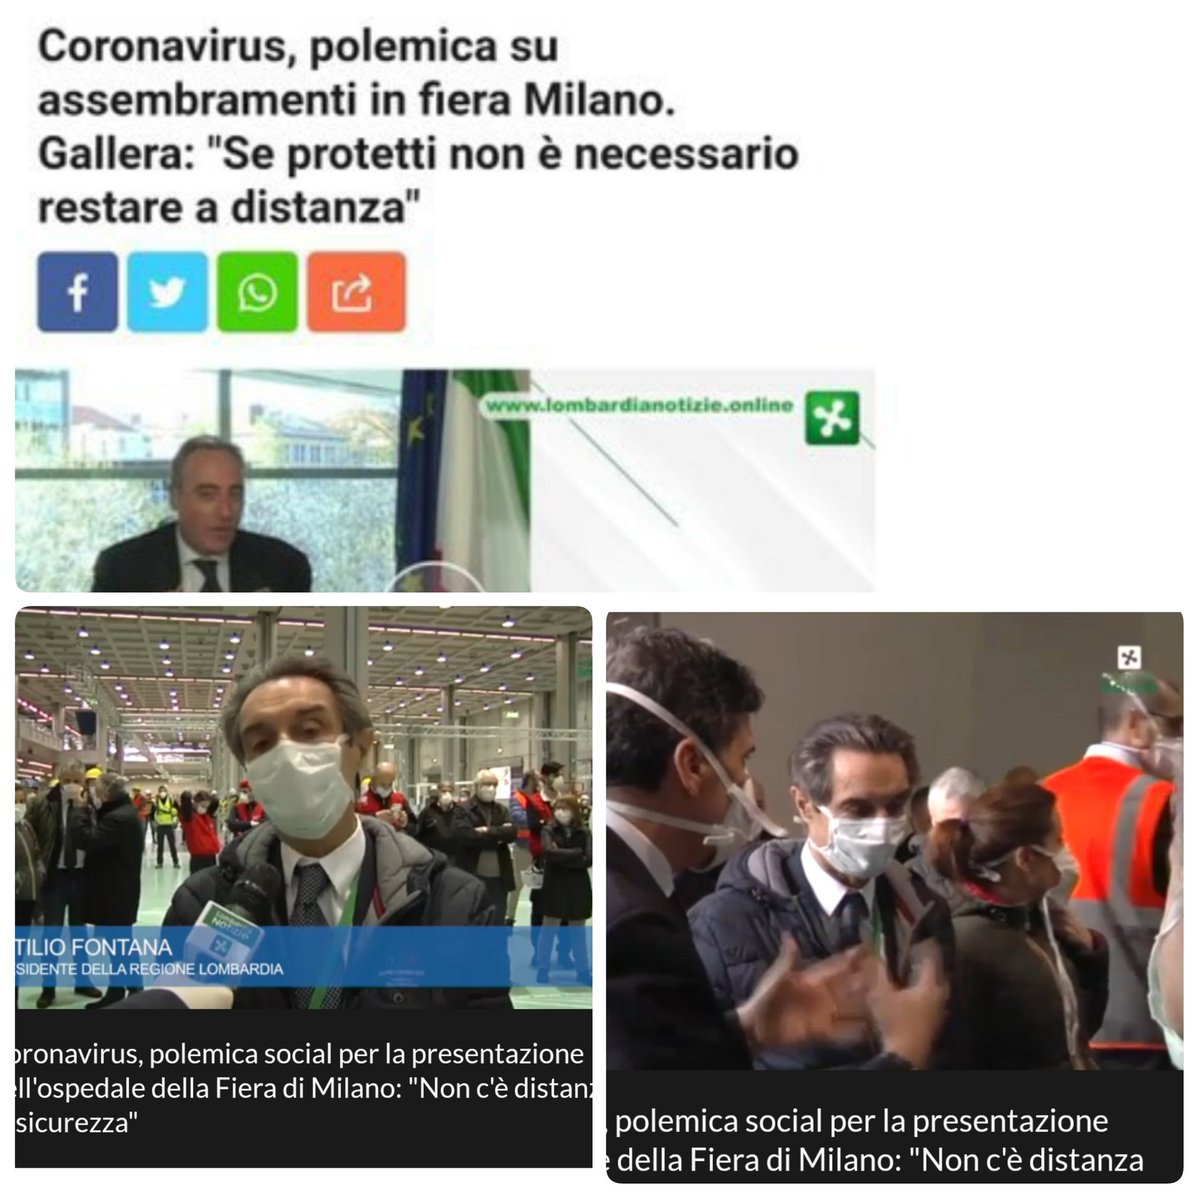 #FieraMilano